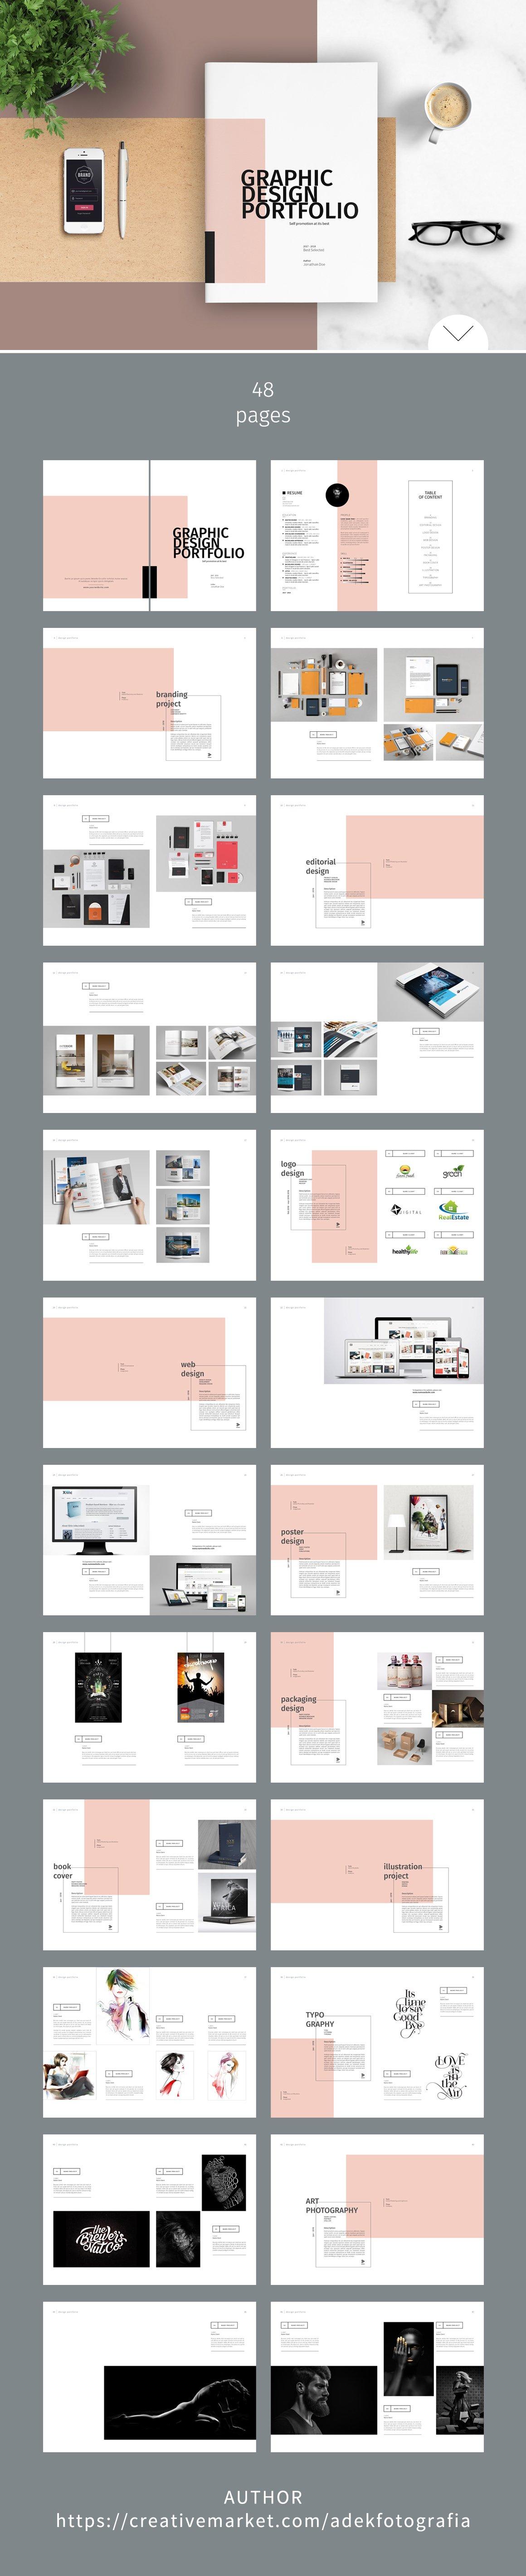 Character Design Portfolio Presentation : Graphic design portfolio template brochure templates